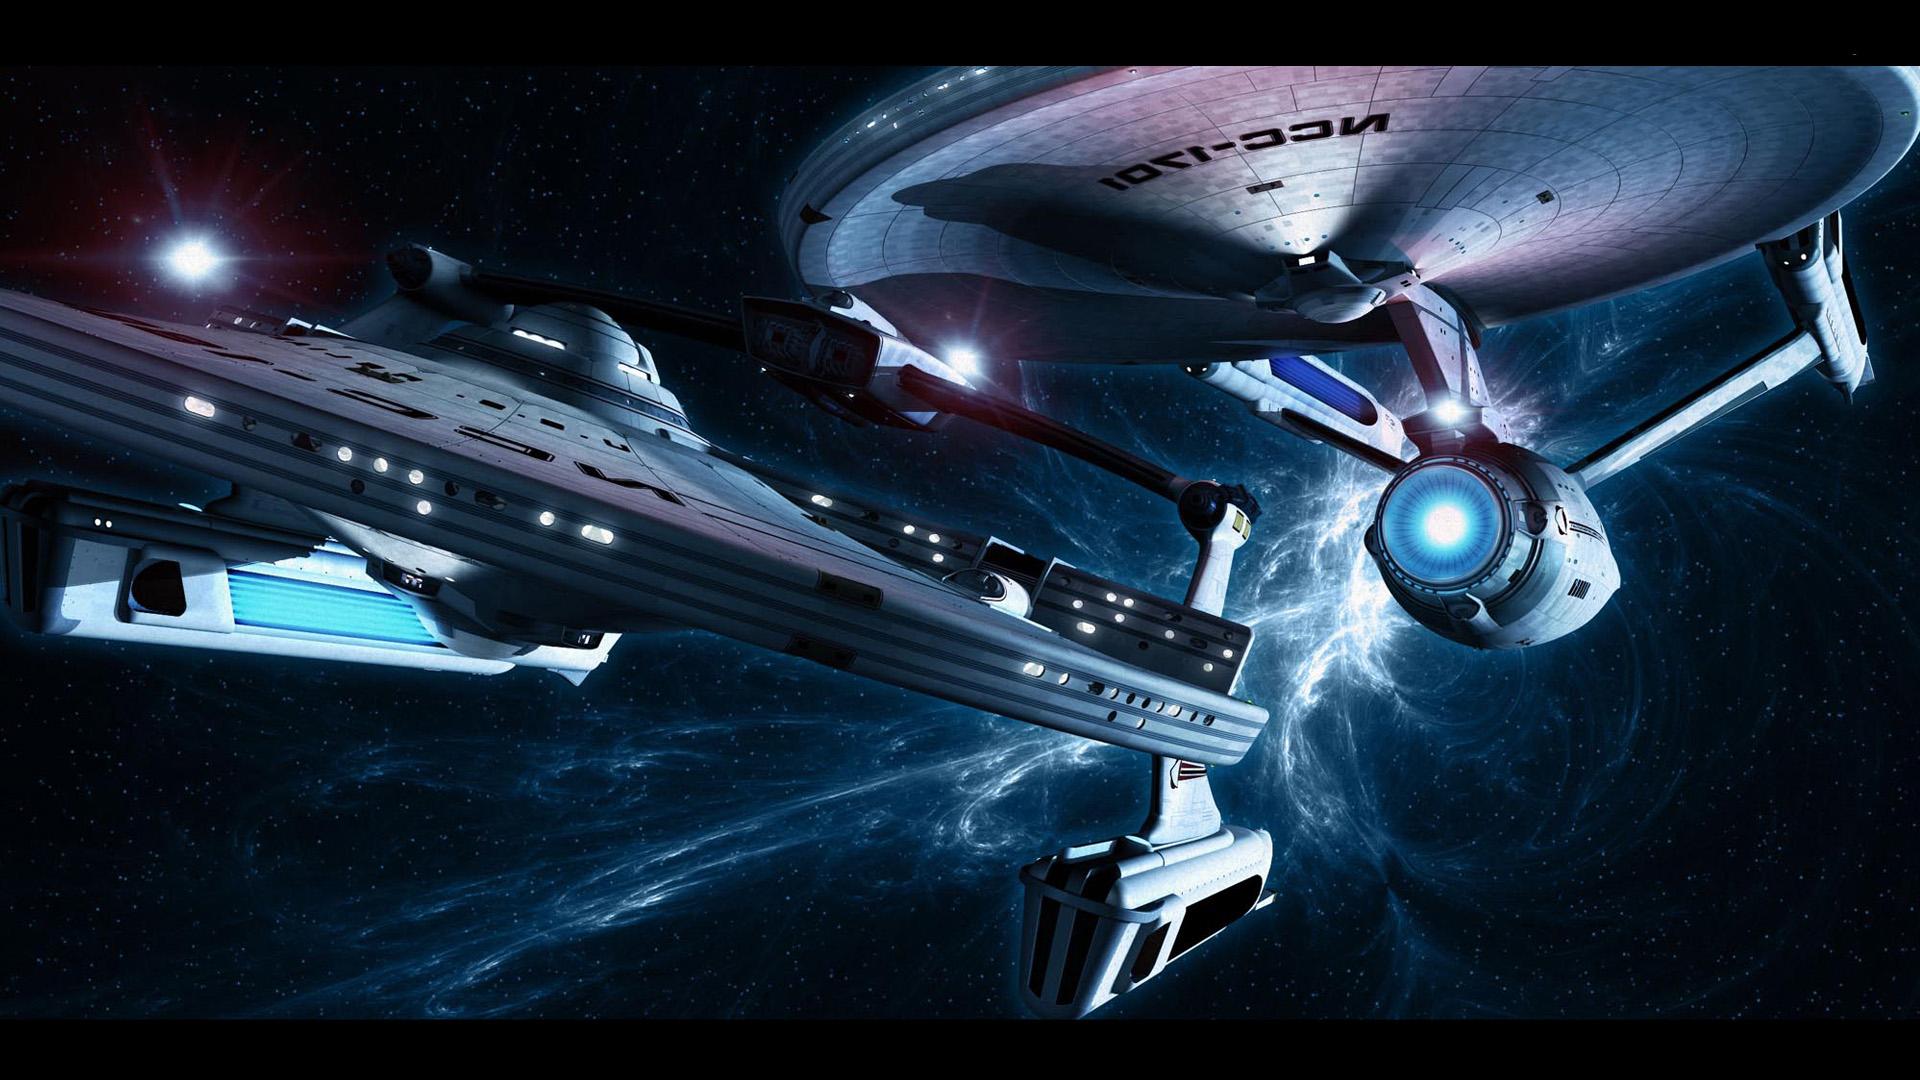 Star Trek HD Wallpapers 1920x1080